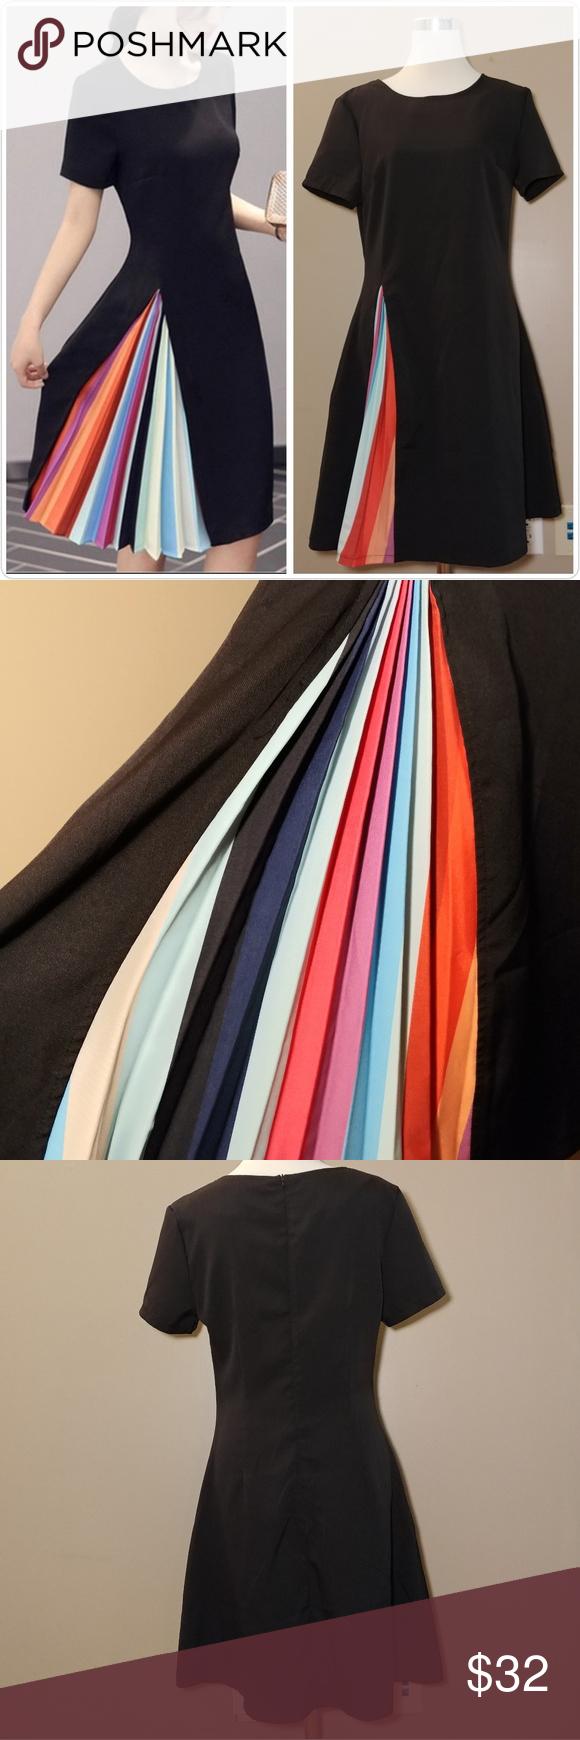 Nwt Black Dress With Hidden Rainbow Pleat Edgy Dress Sleeve Designs Black Dress [ 1740 x 580 Pixel ]